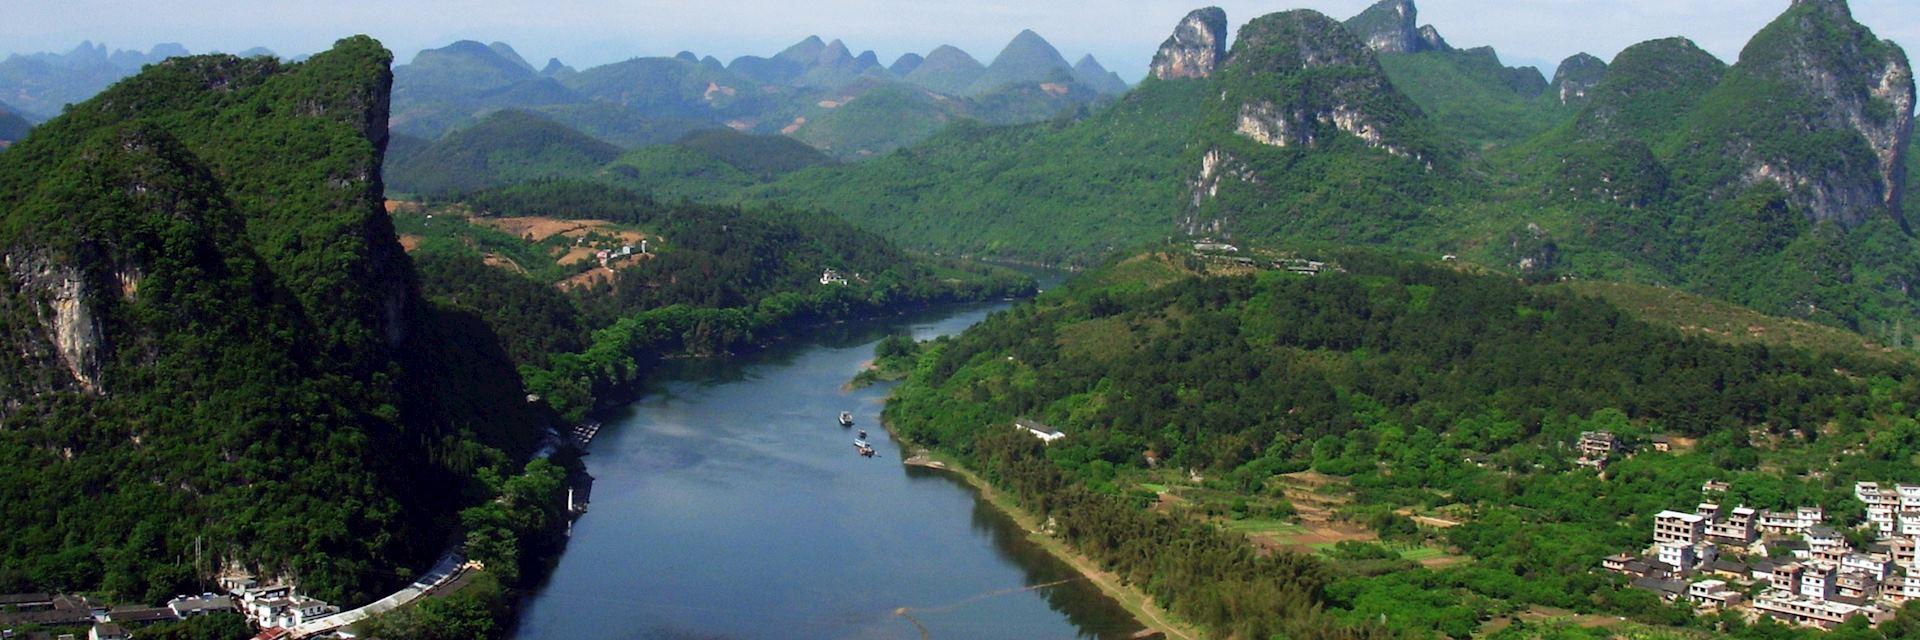 Cruise through the limestone pinnacles in Yangshuo